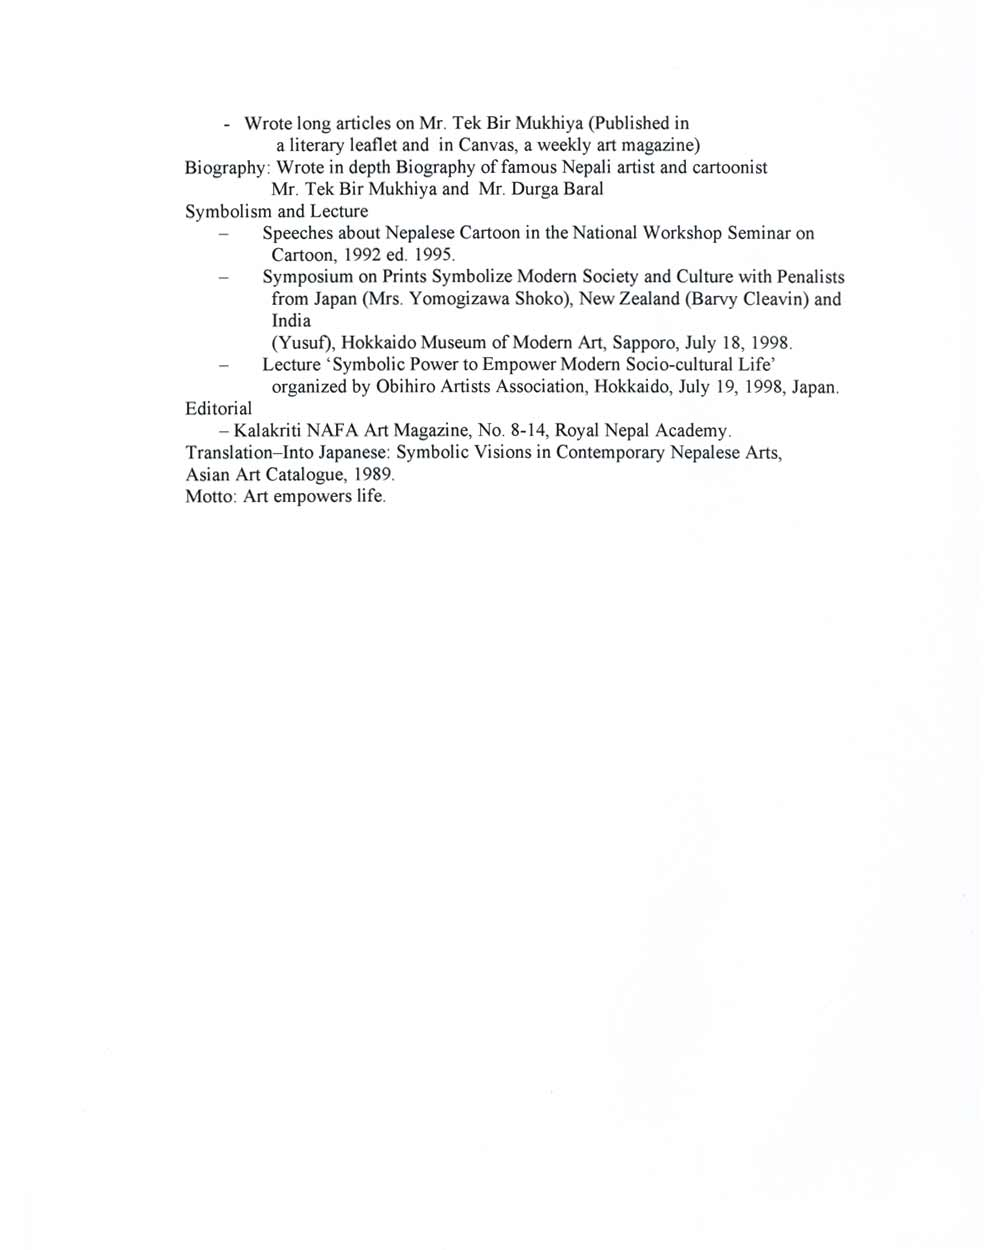 Ram Kumar Panday's Resume, pg 4